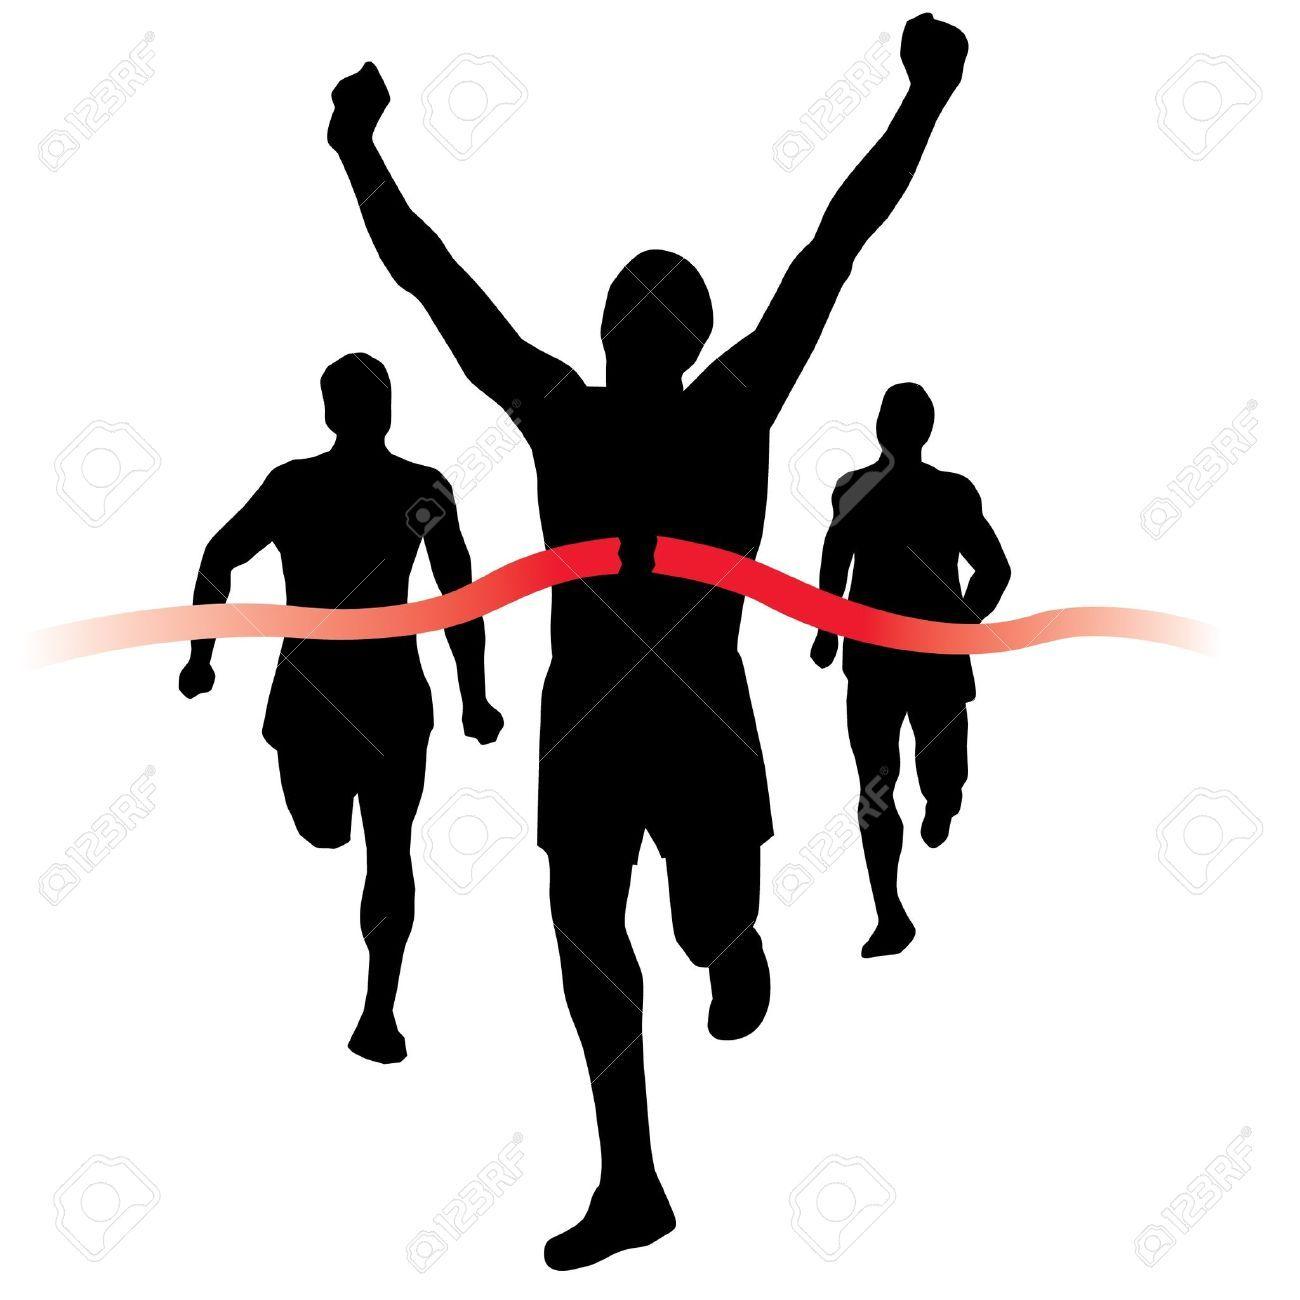 Runner crossing finish line clipart » Clipart Portal.